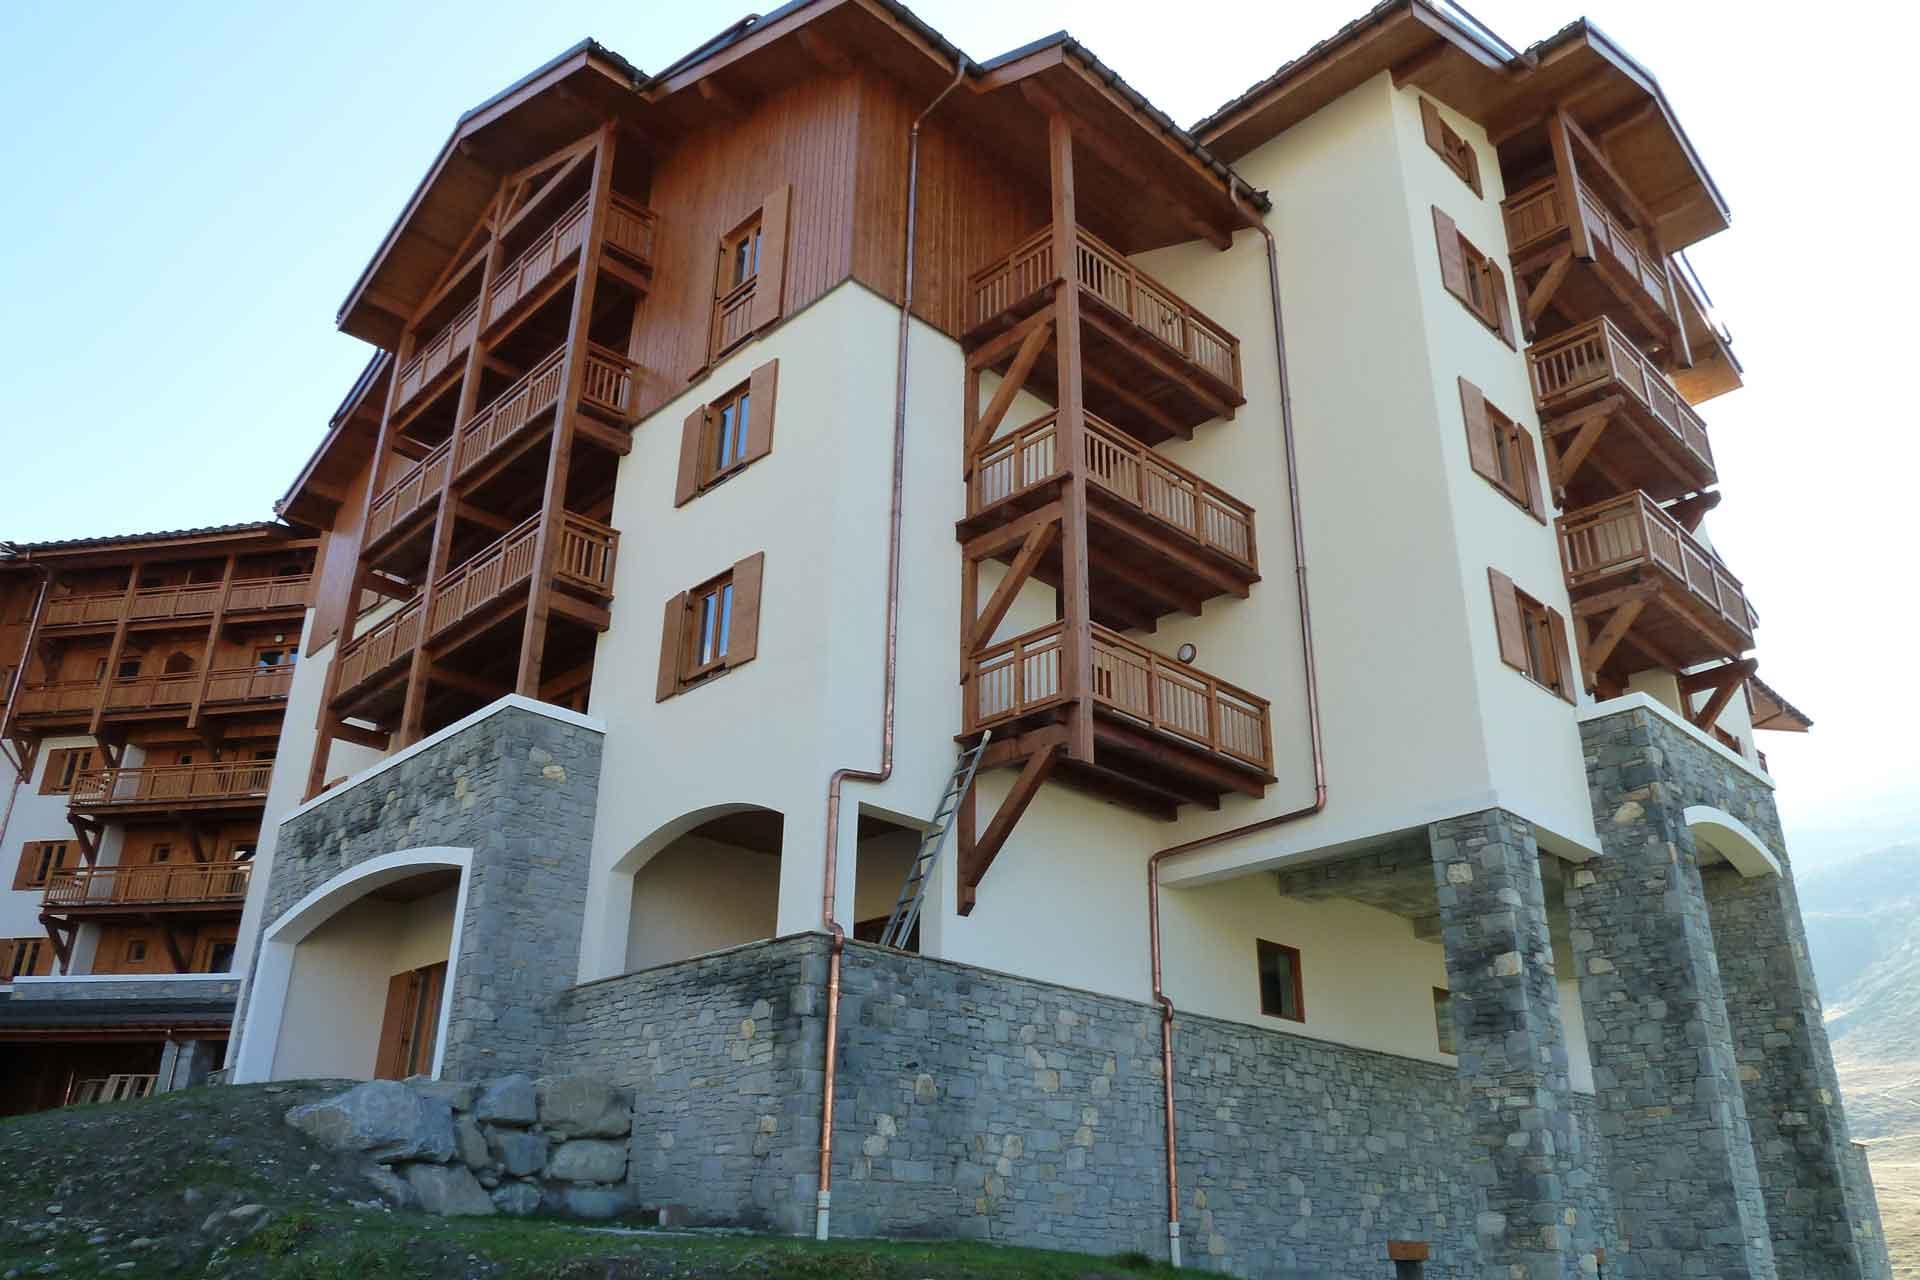 140-hotel-chaletmontvallon-img-(5)